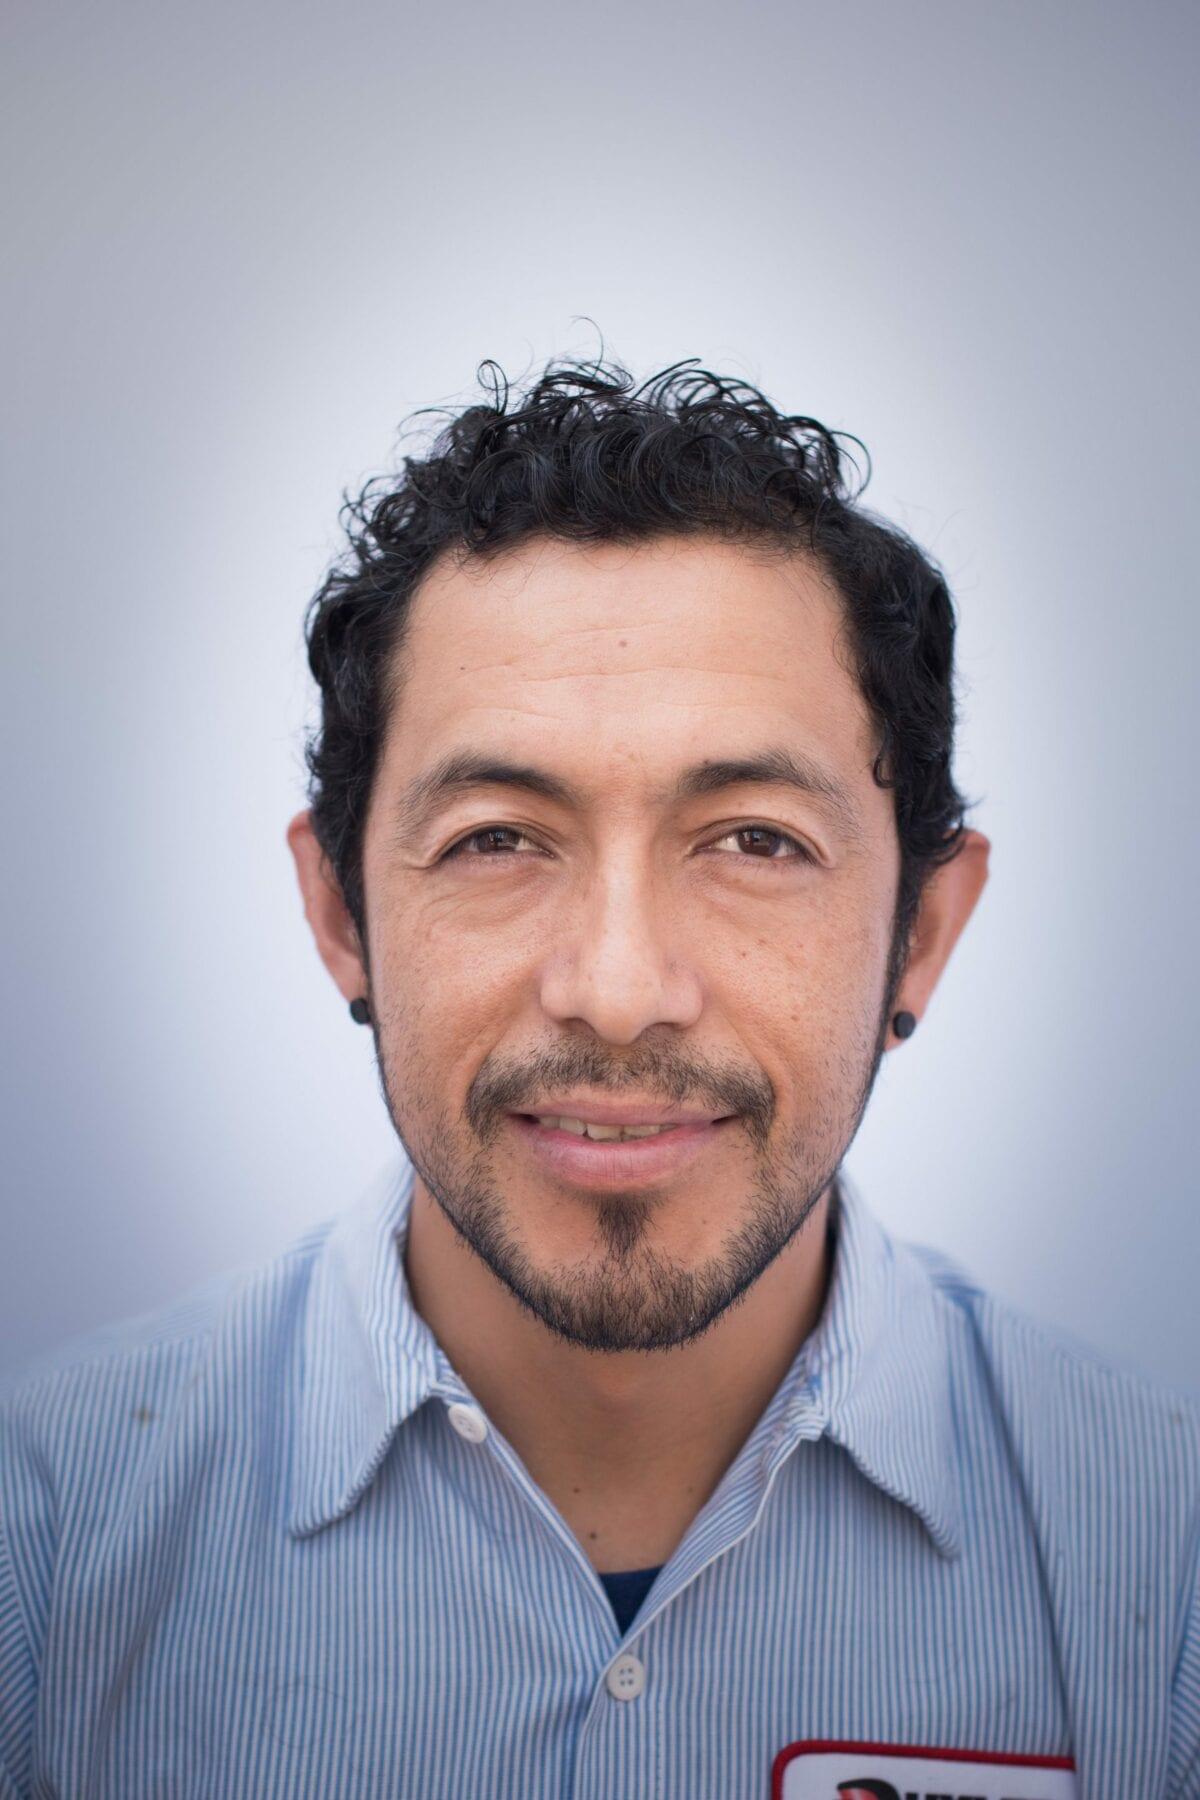 Jorge Garfias